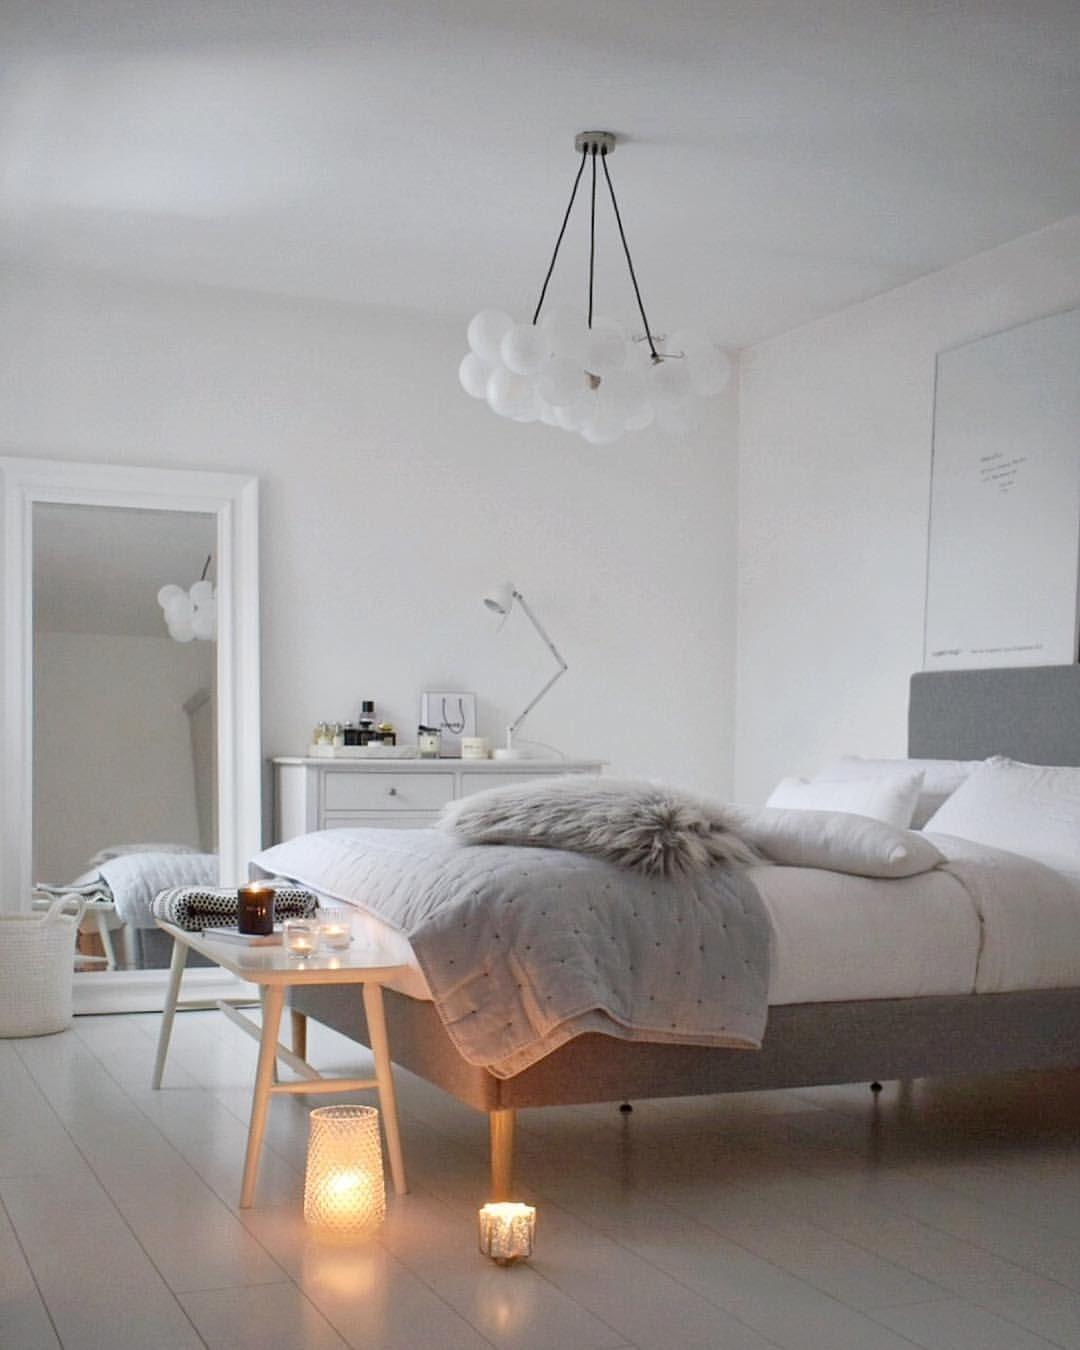 Simple White Bedroom Decor Scandinavian Style White Bedroom White Bedroom Decor Simple Bedroom Bedroom Interior